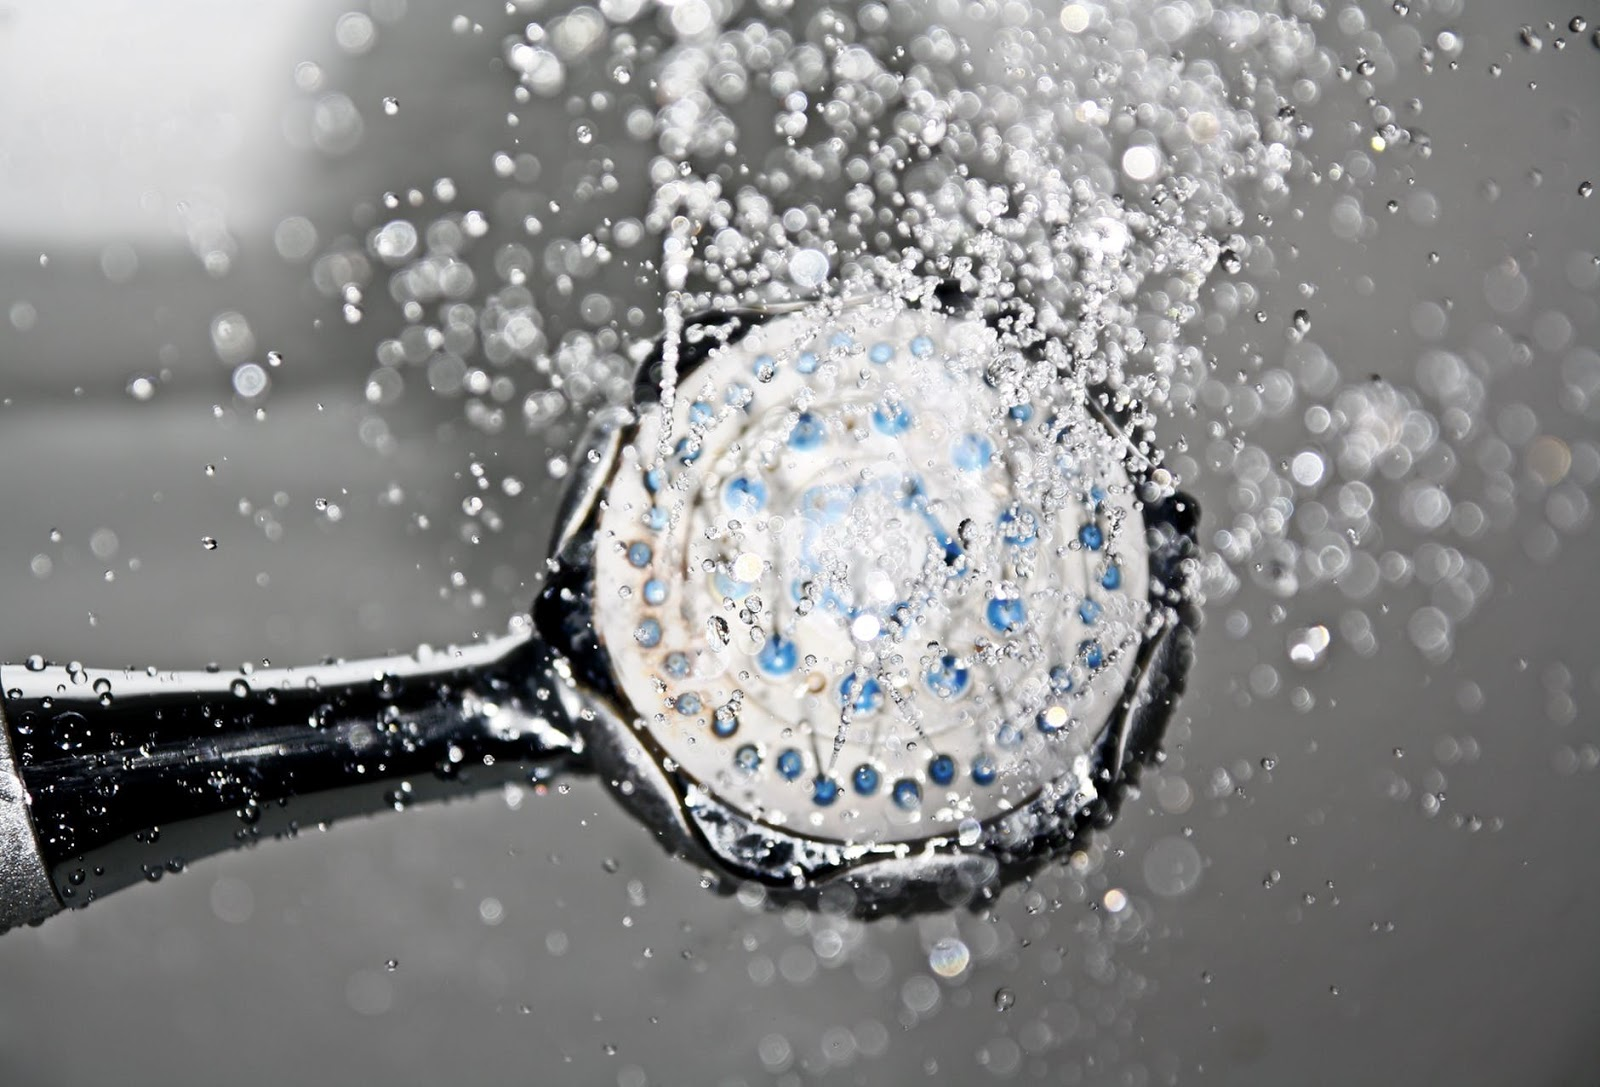 Shower vs. Bath